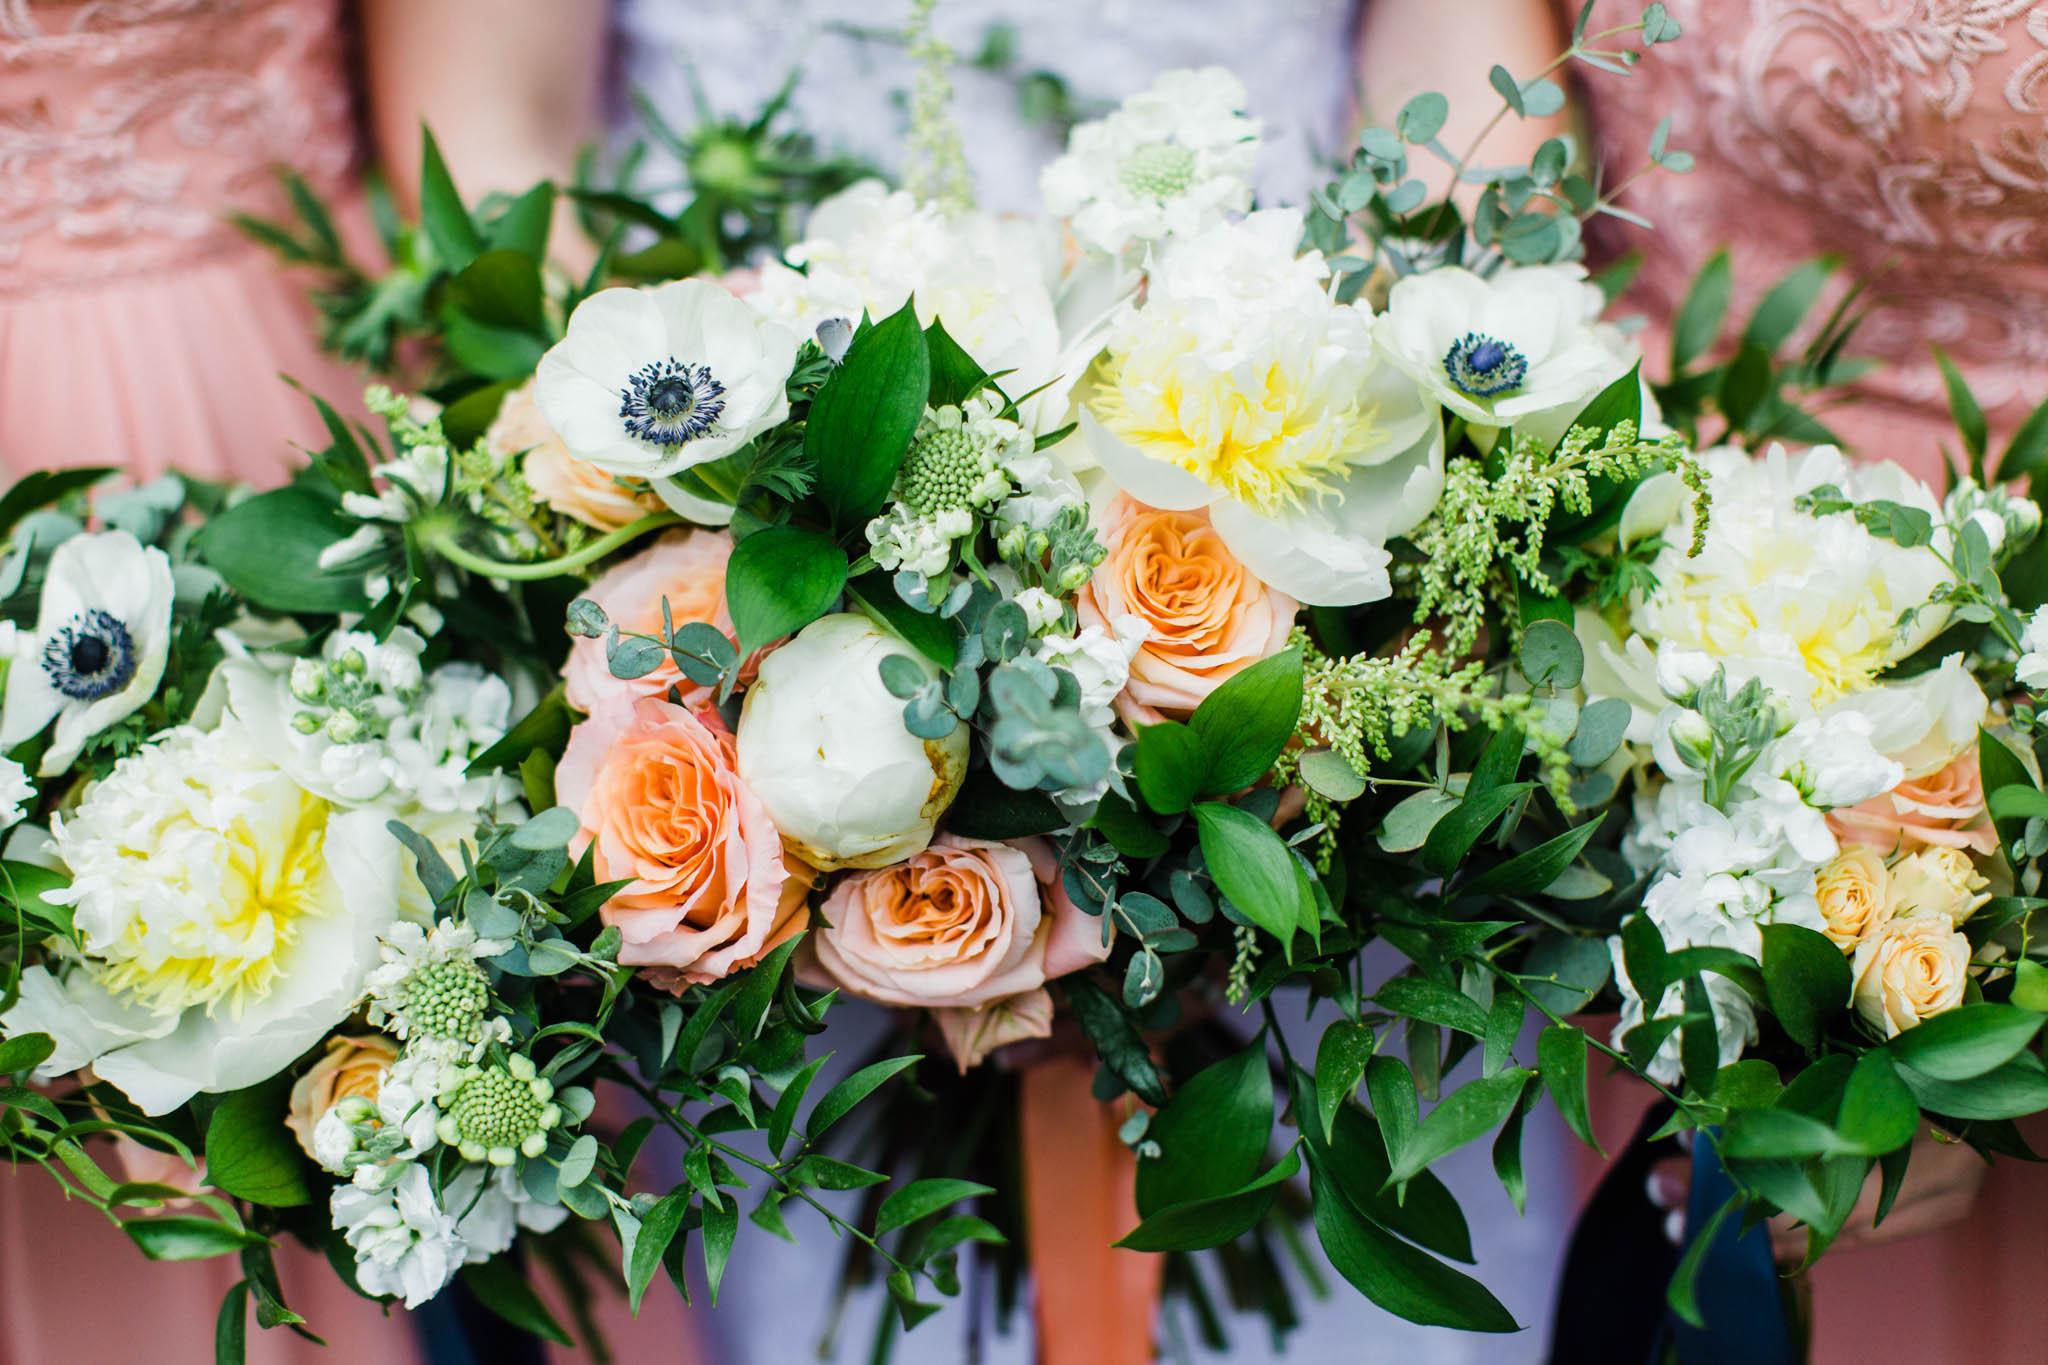 lynchburg-virginia-wedding-photographer-70.jpg